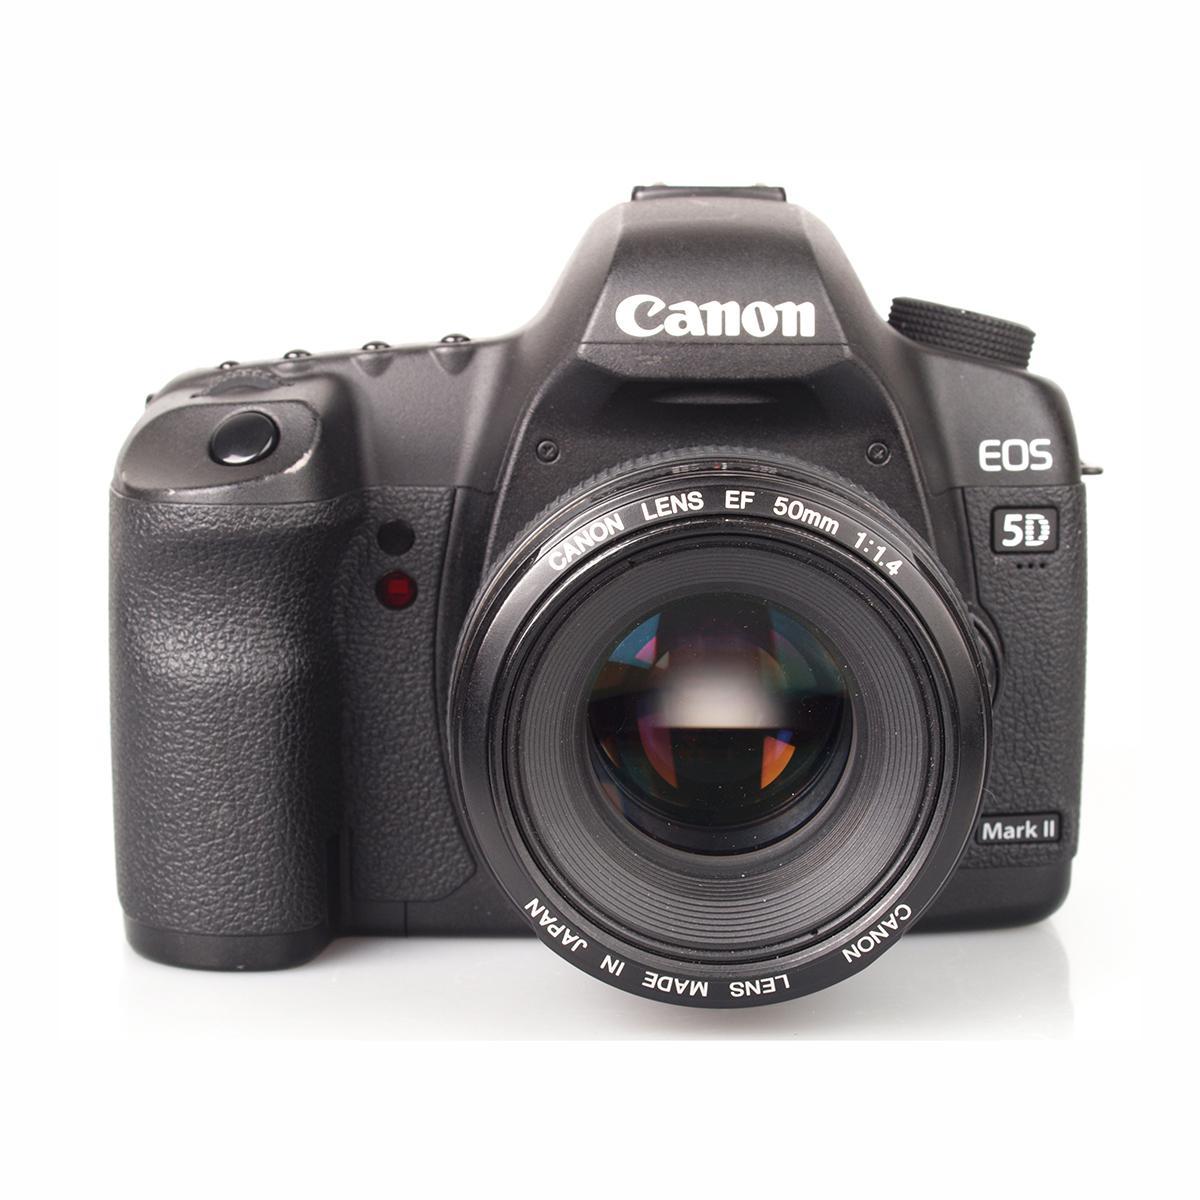 Immagine Canon 5D Mark II